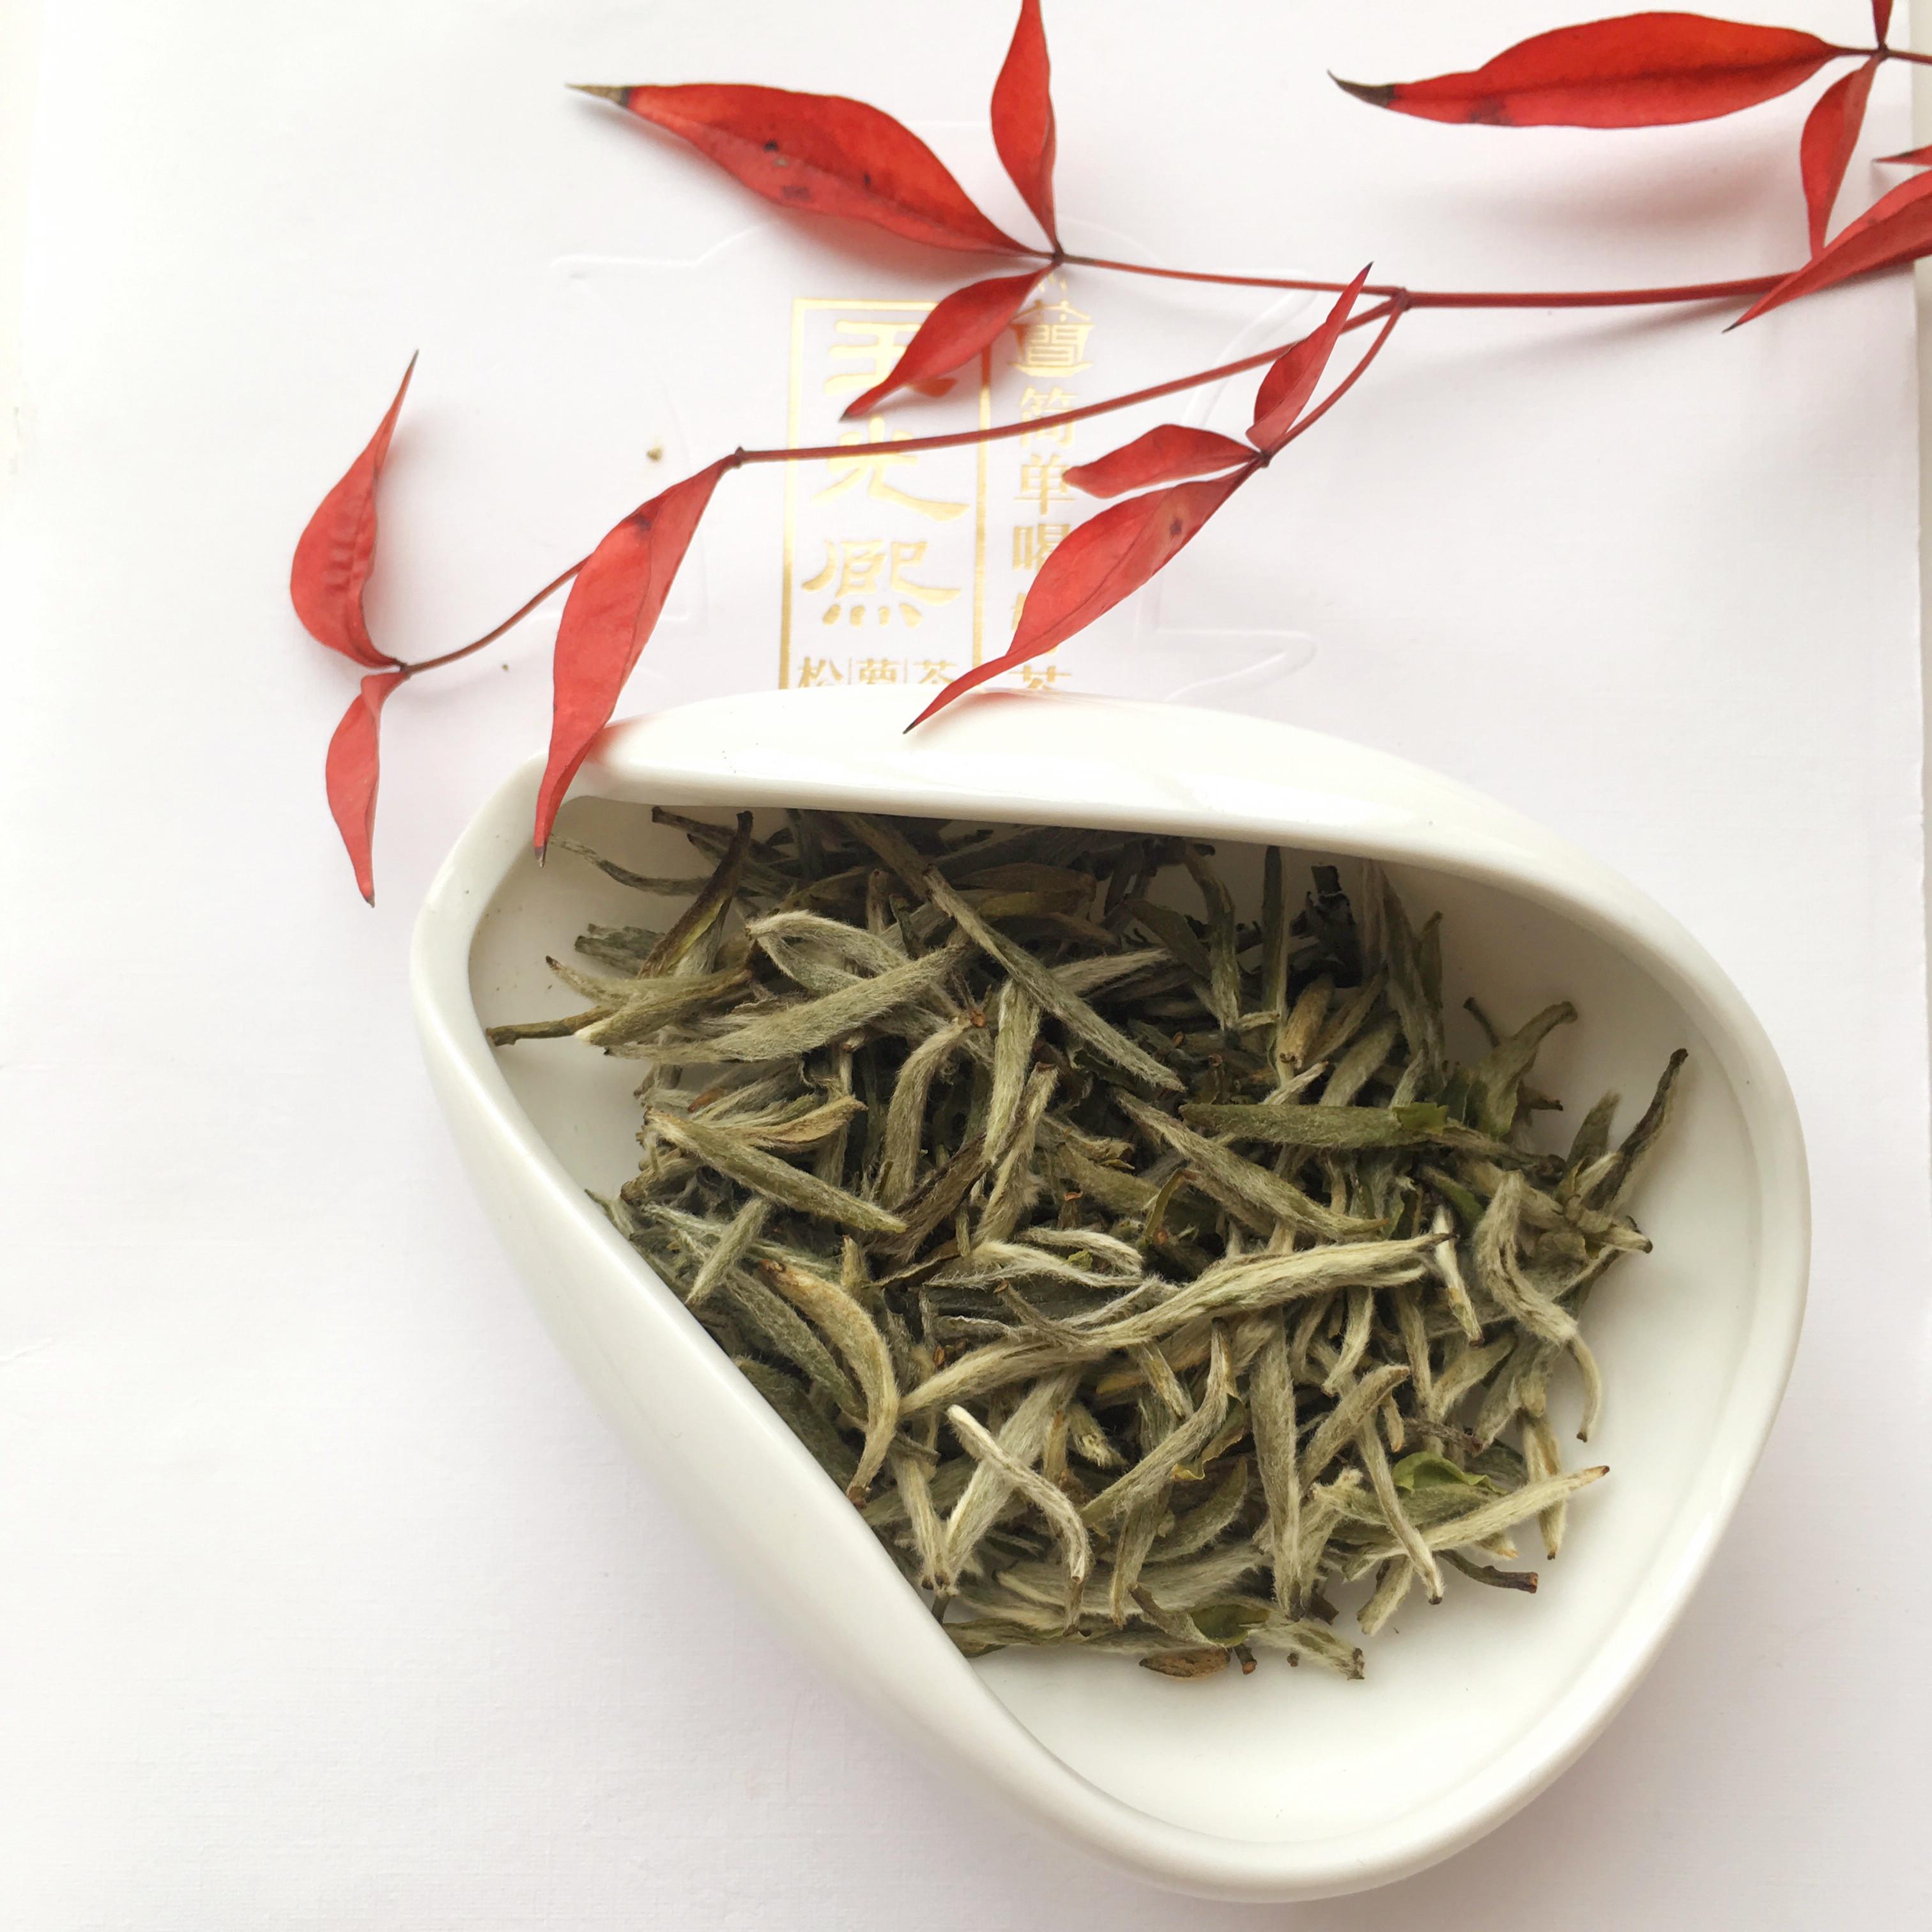 EU standard Sliver Needles bai hao yinzhen white tea - 4uTea | 4uTea.com